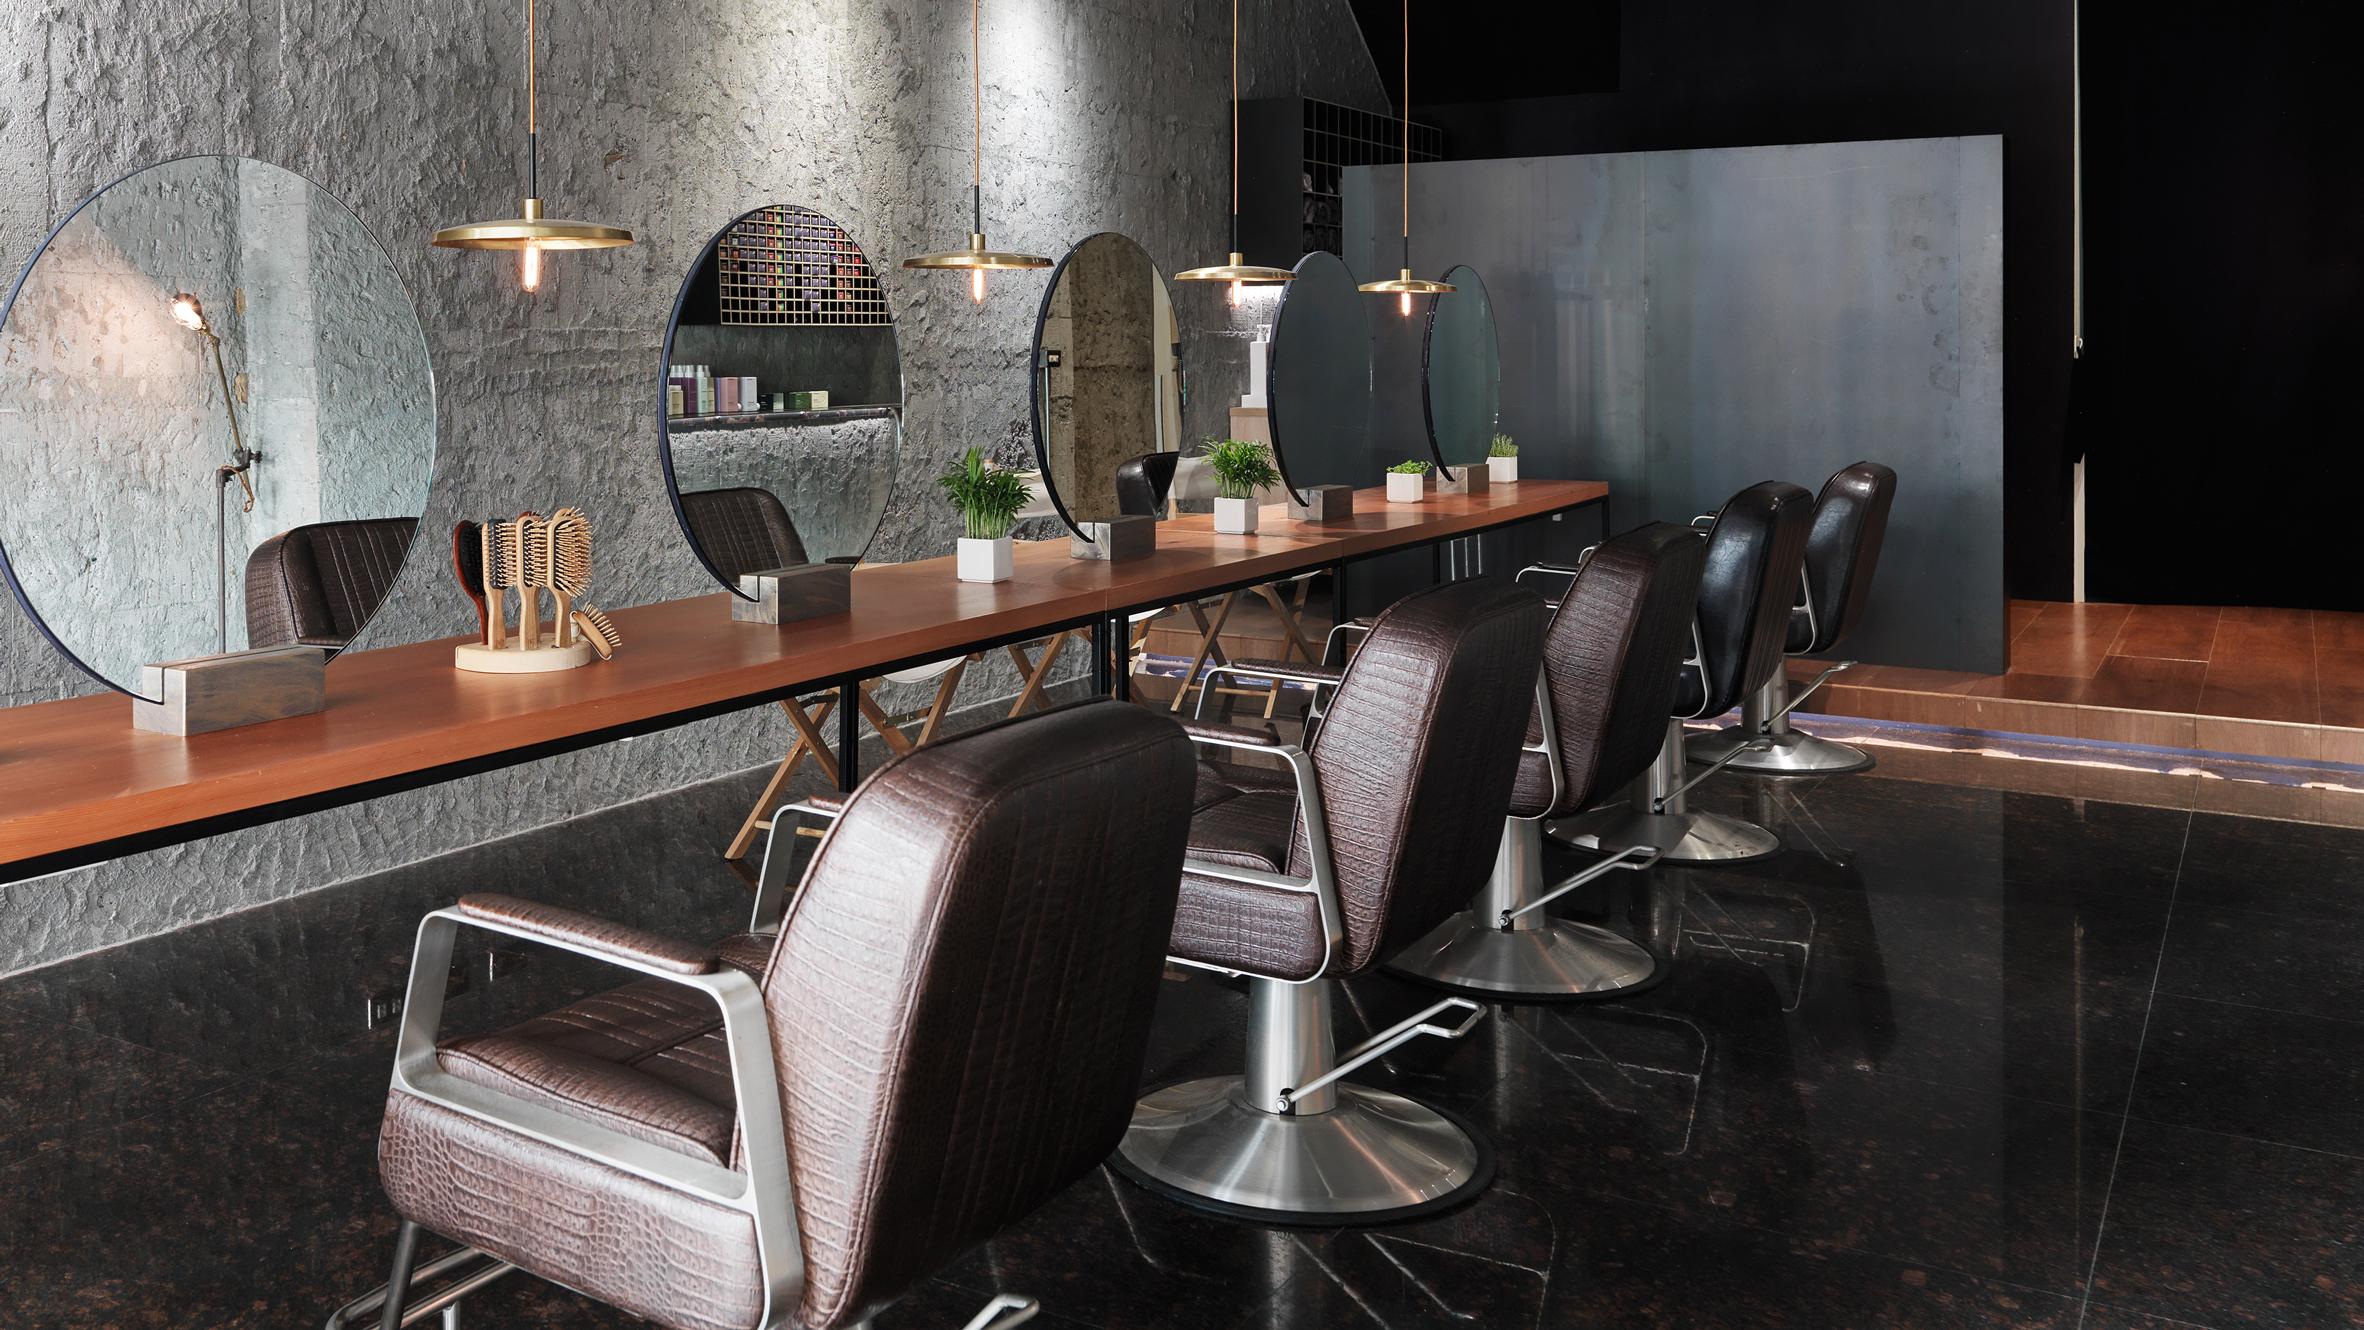 luna-salon-soar-design-interiors-changhua-taiwan_dezeen_hero